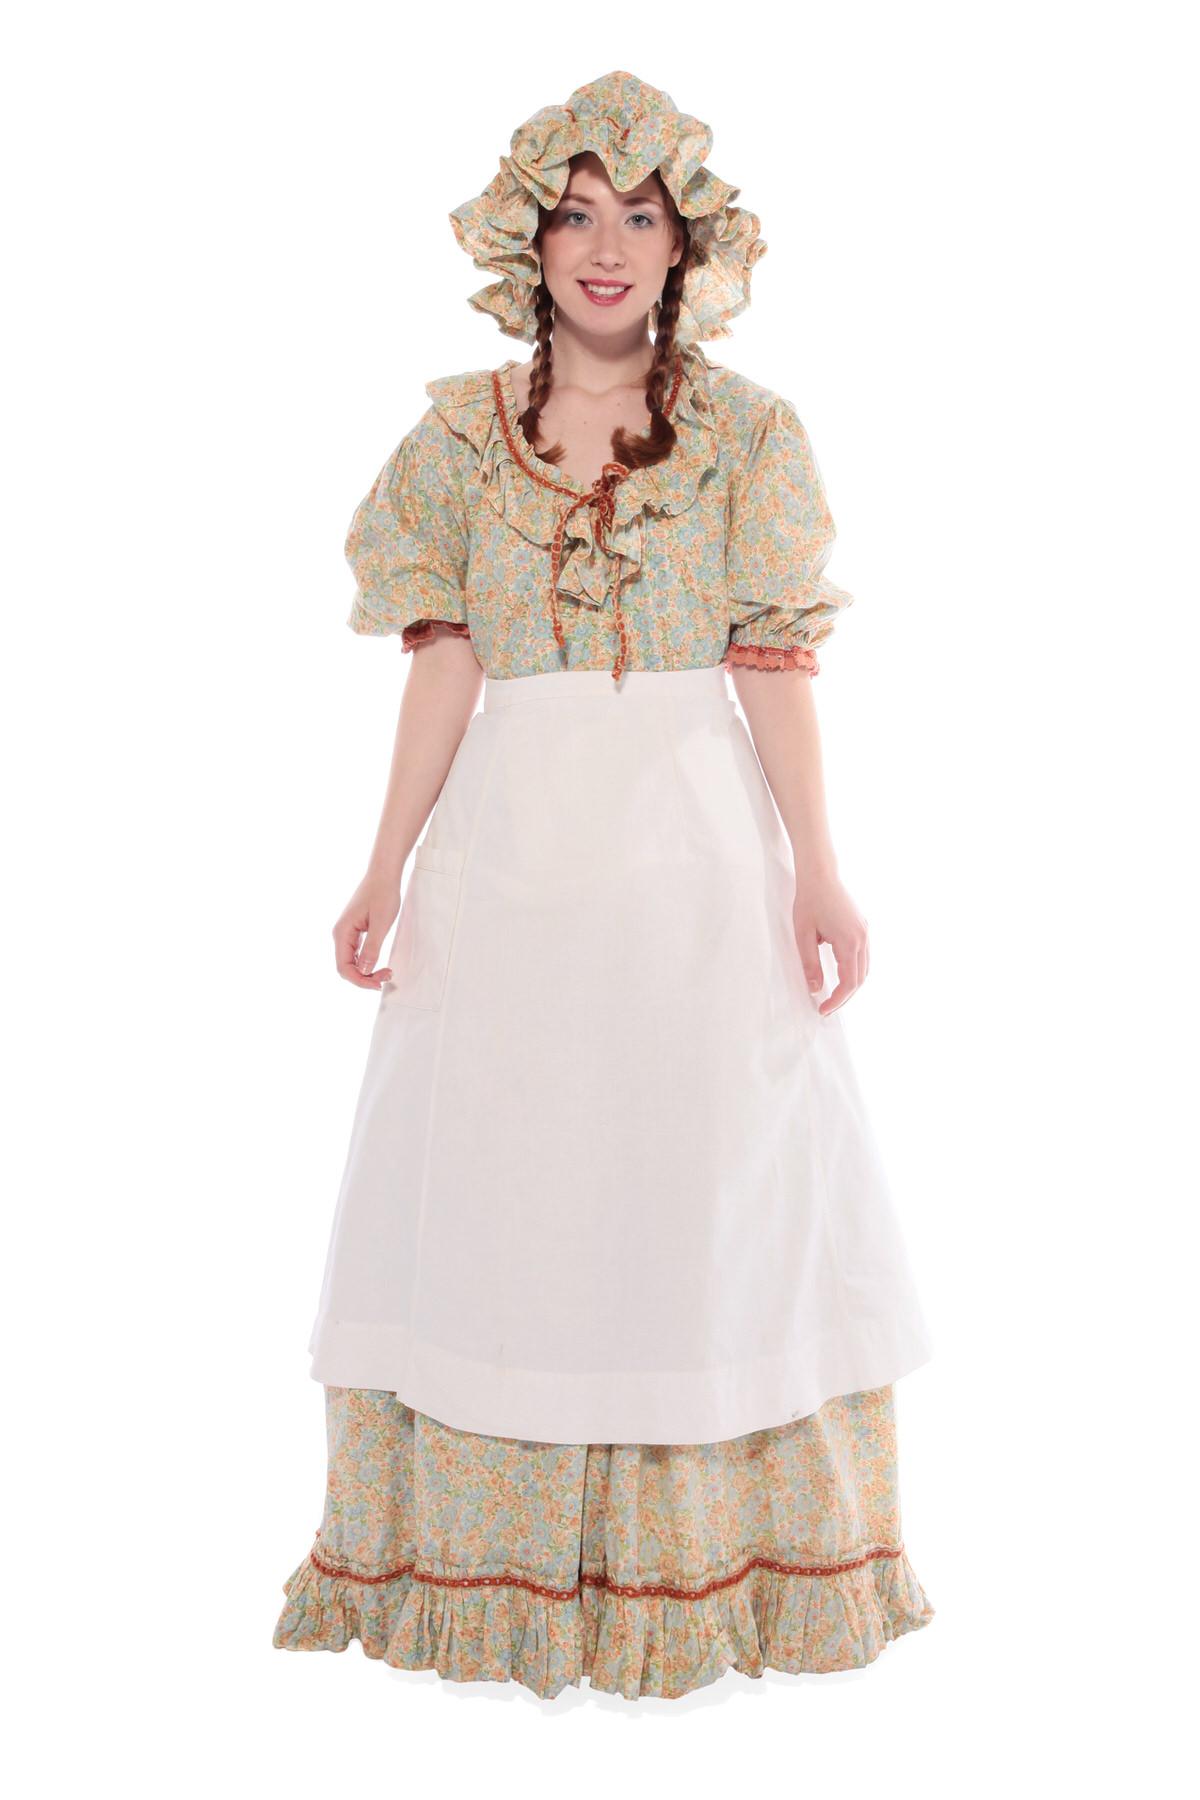 PRAIRIE GIRL COSTUME W PATTERNED LONG DRESS